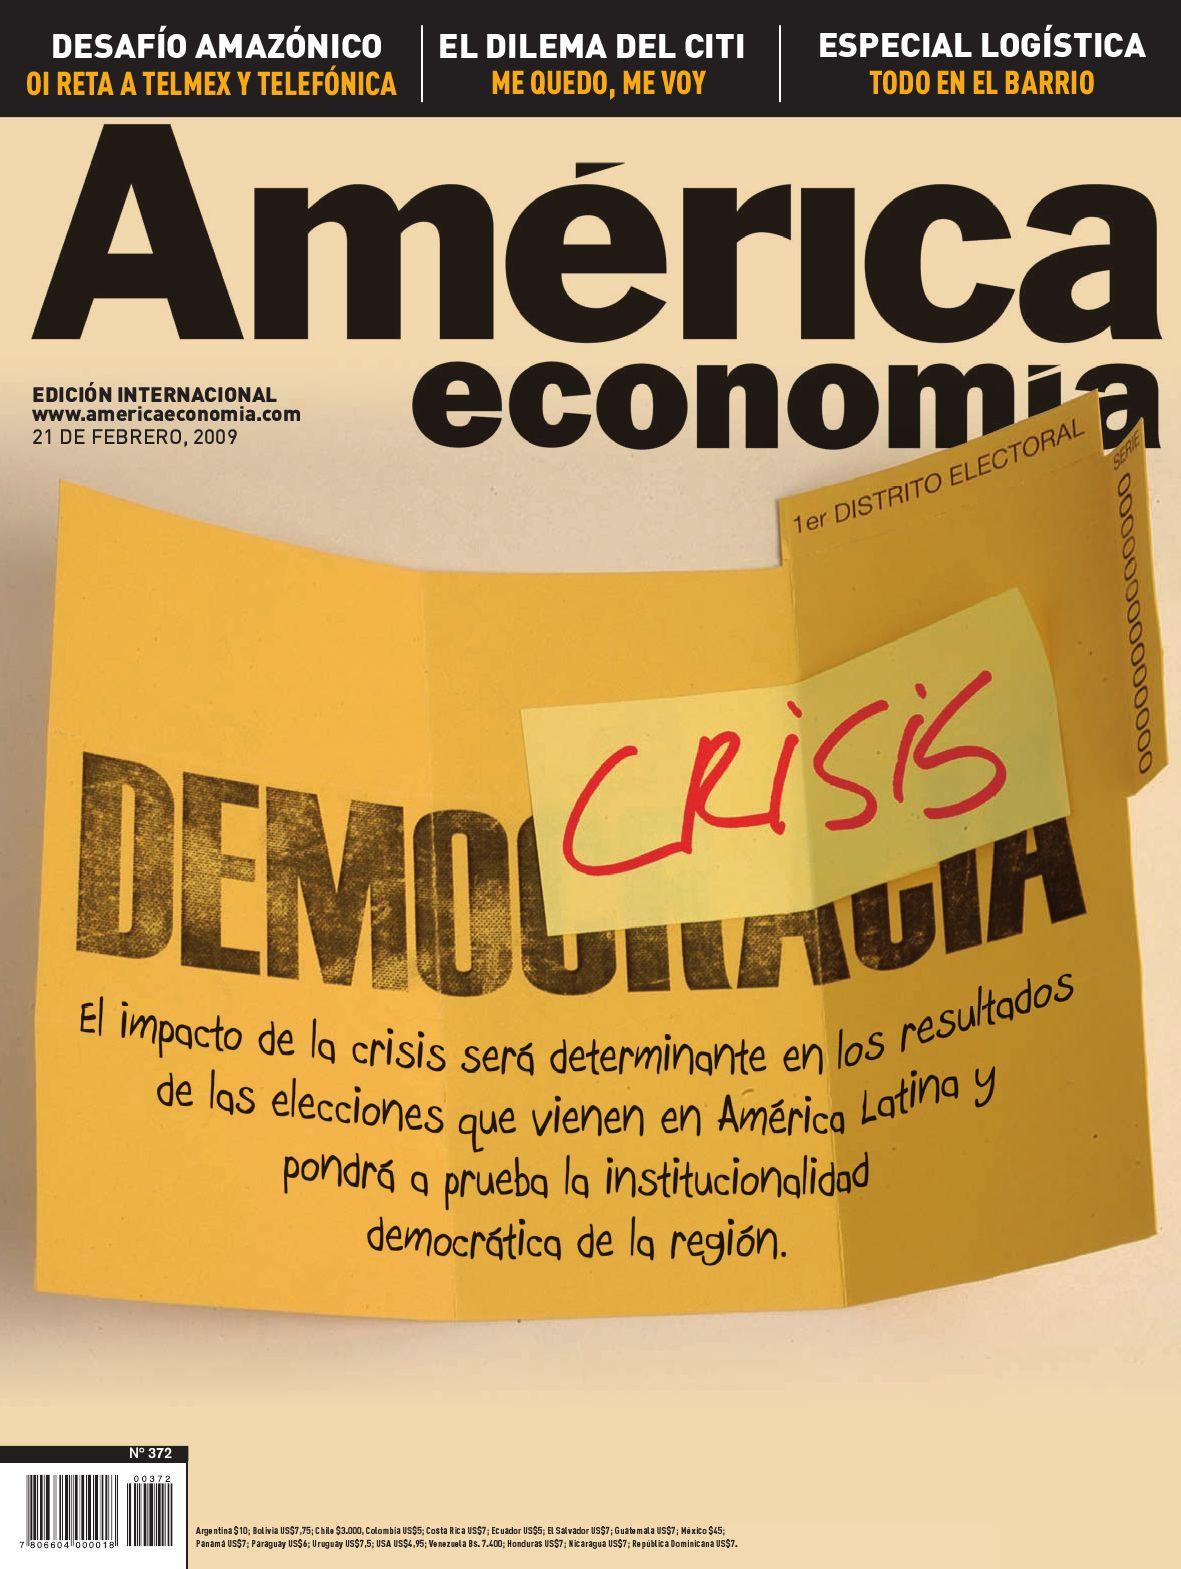 Nº 372 Edición Internacional by AméricaEconomía - issuu f64ebf17b2a95